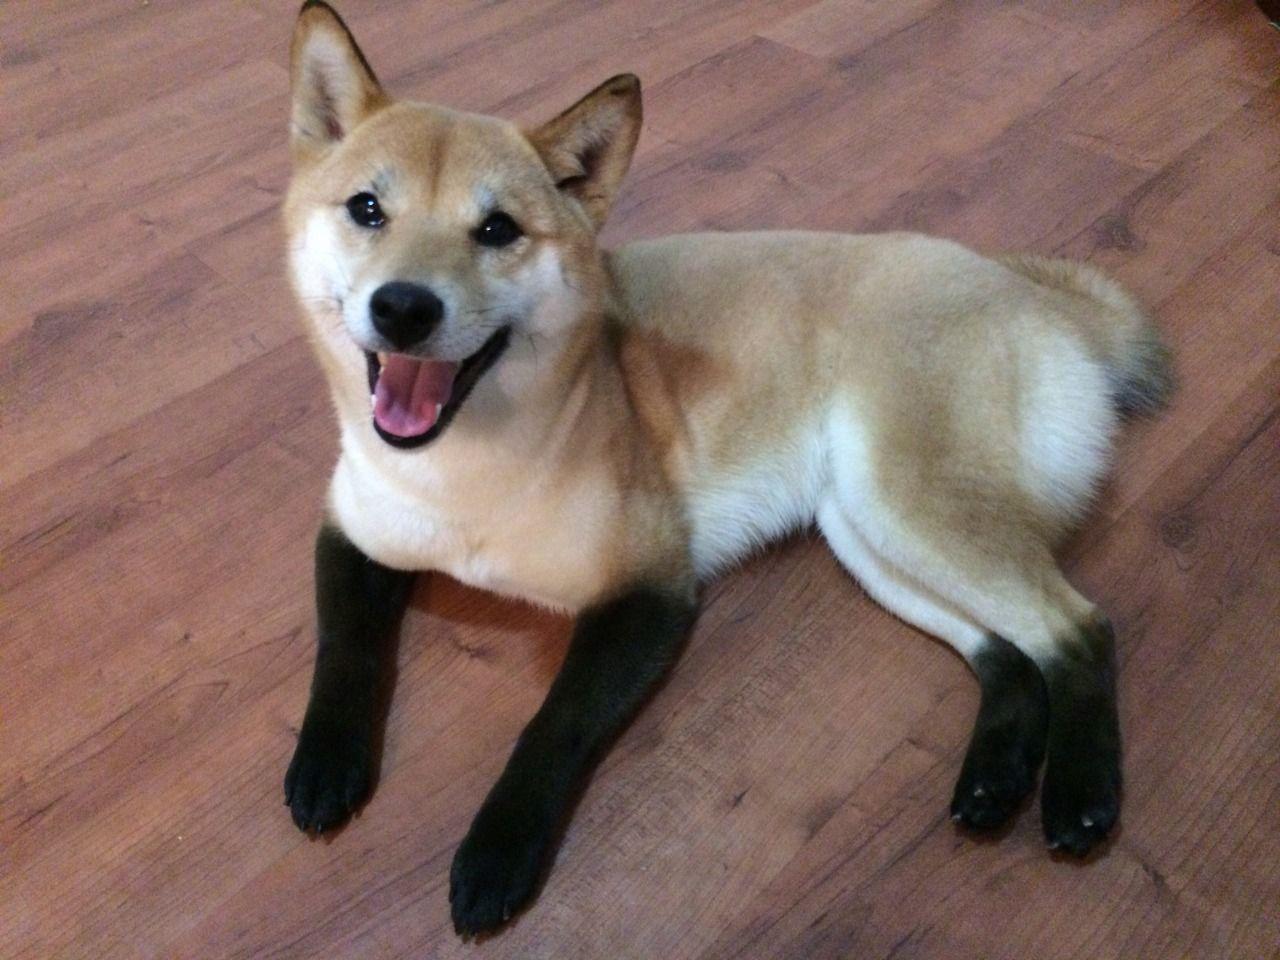 I Love His Black Feet And Legs Smiling Dogs Cute Corgi Puppy Shiba Inu